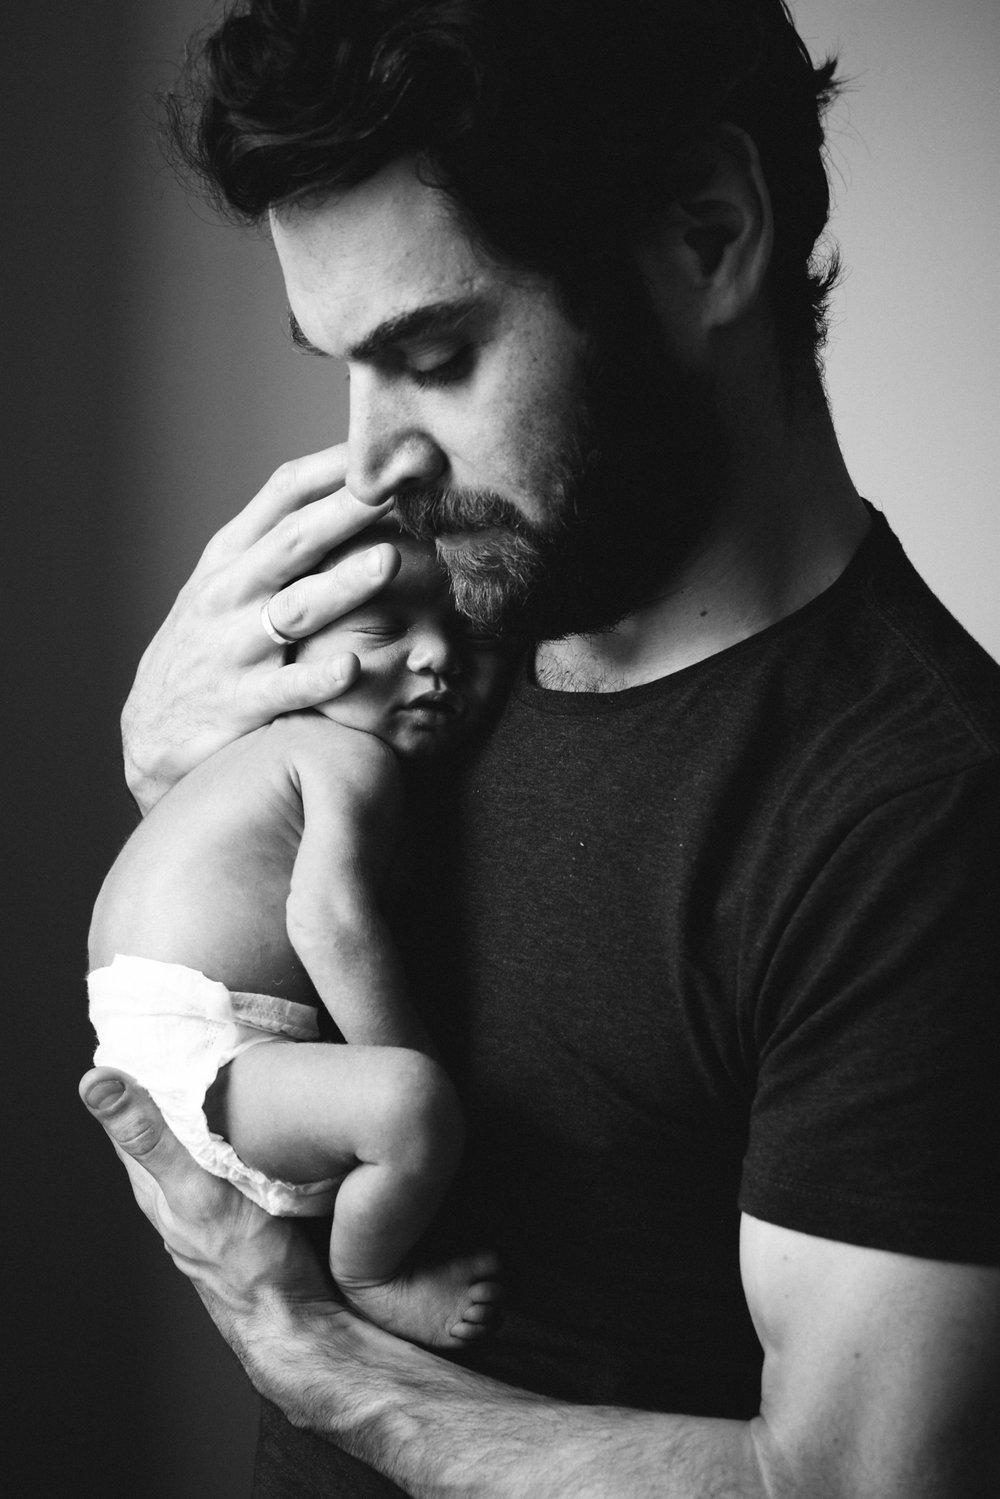 Bebe_toute_annee_Marianne_Charland_photographe_famille_nouveau-ne_enfant_Montreal_Basse-2.jpg